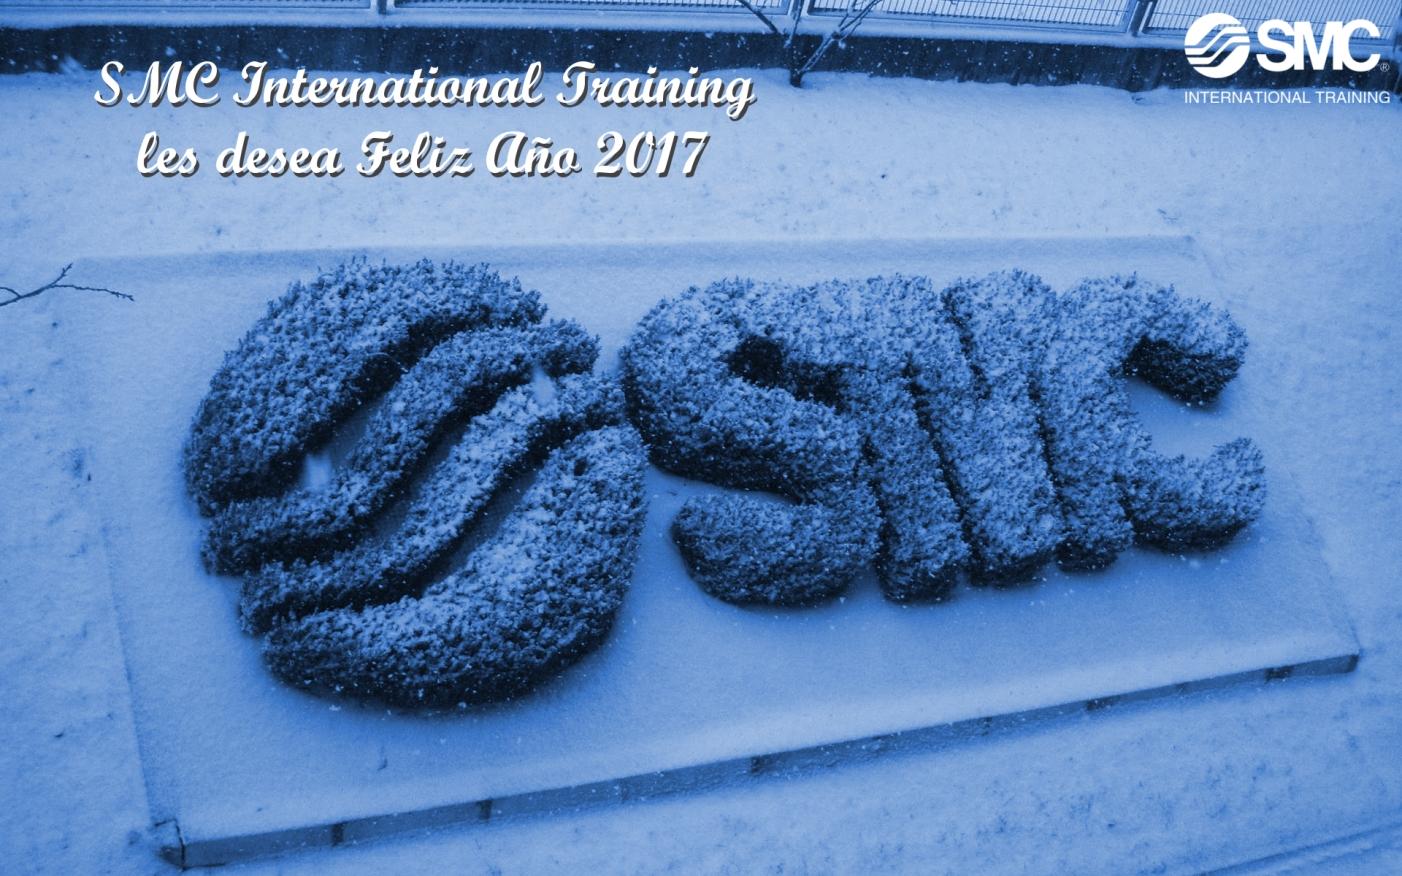 SMC International Training les desea Feliz Año 2017